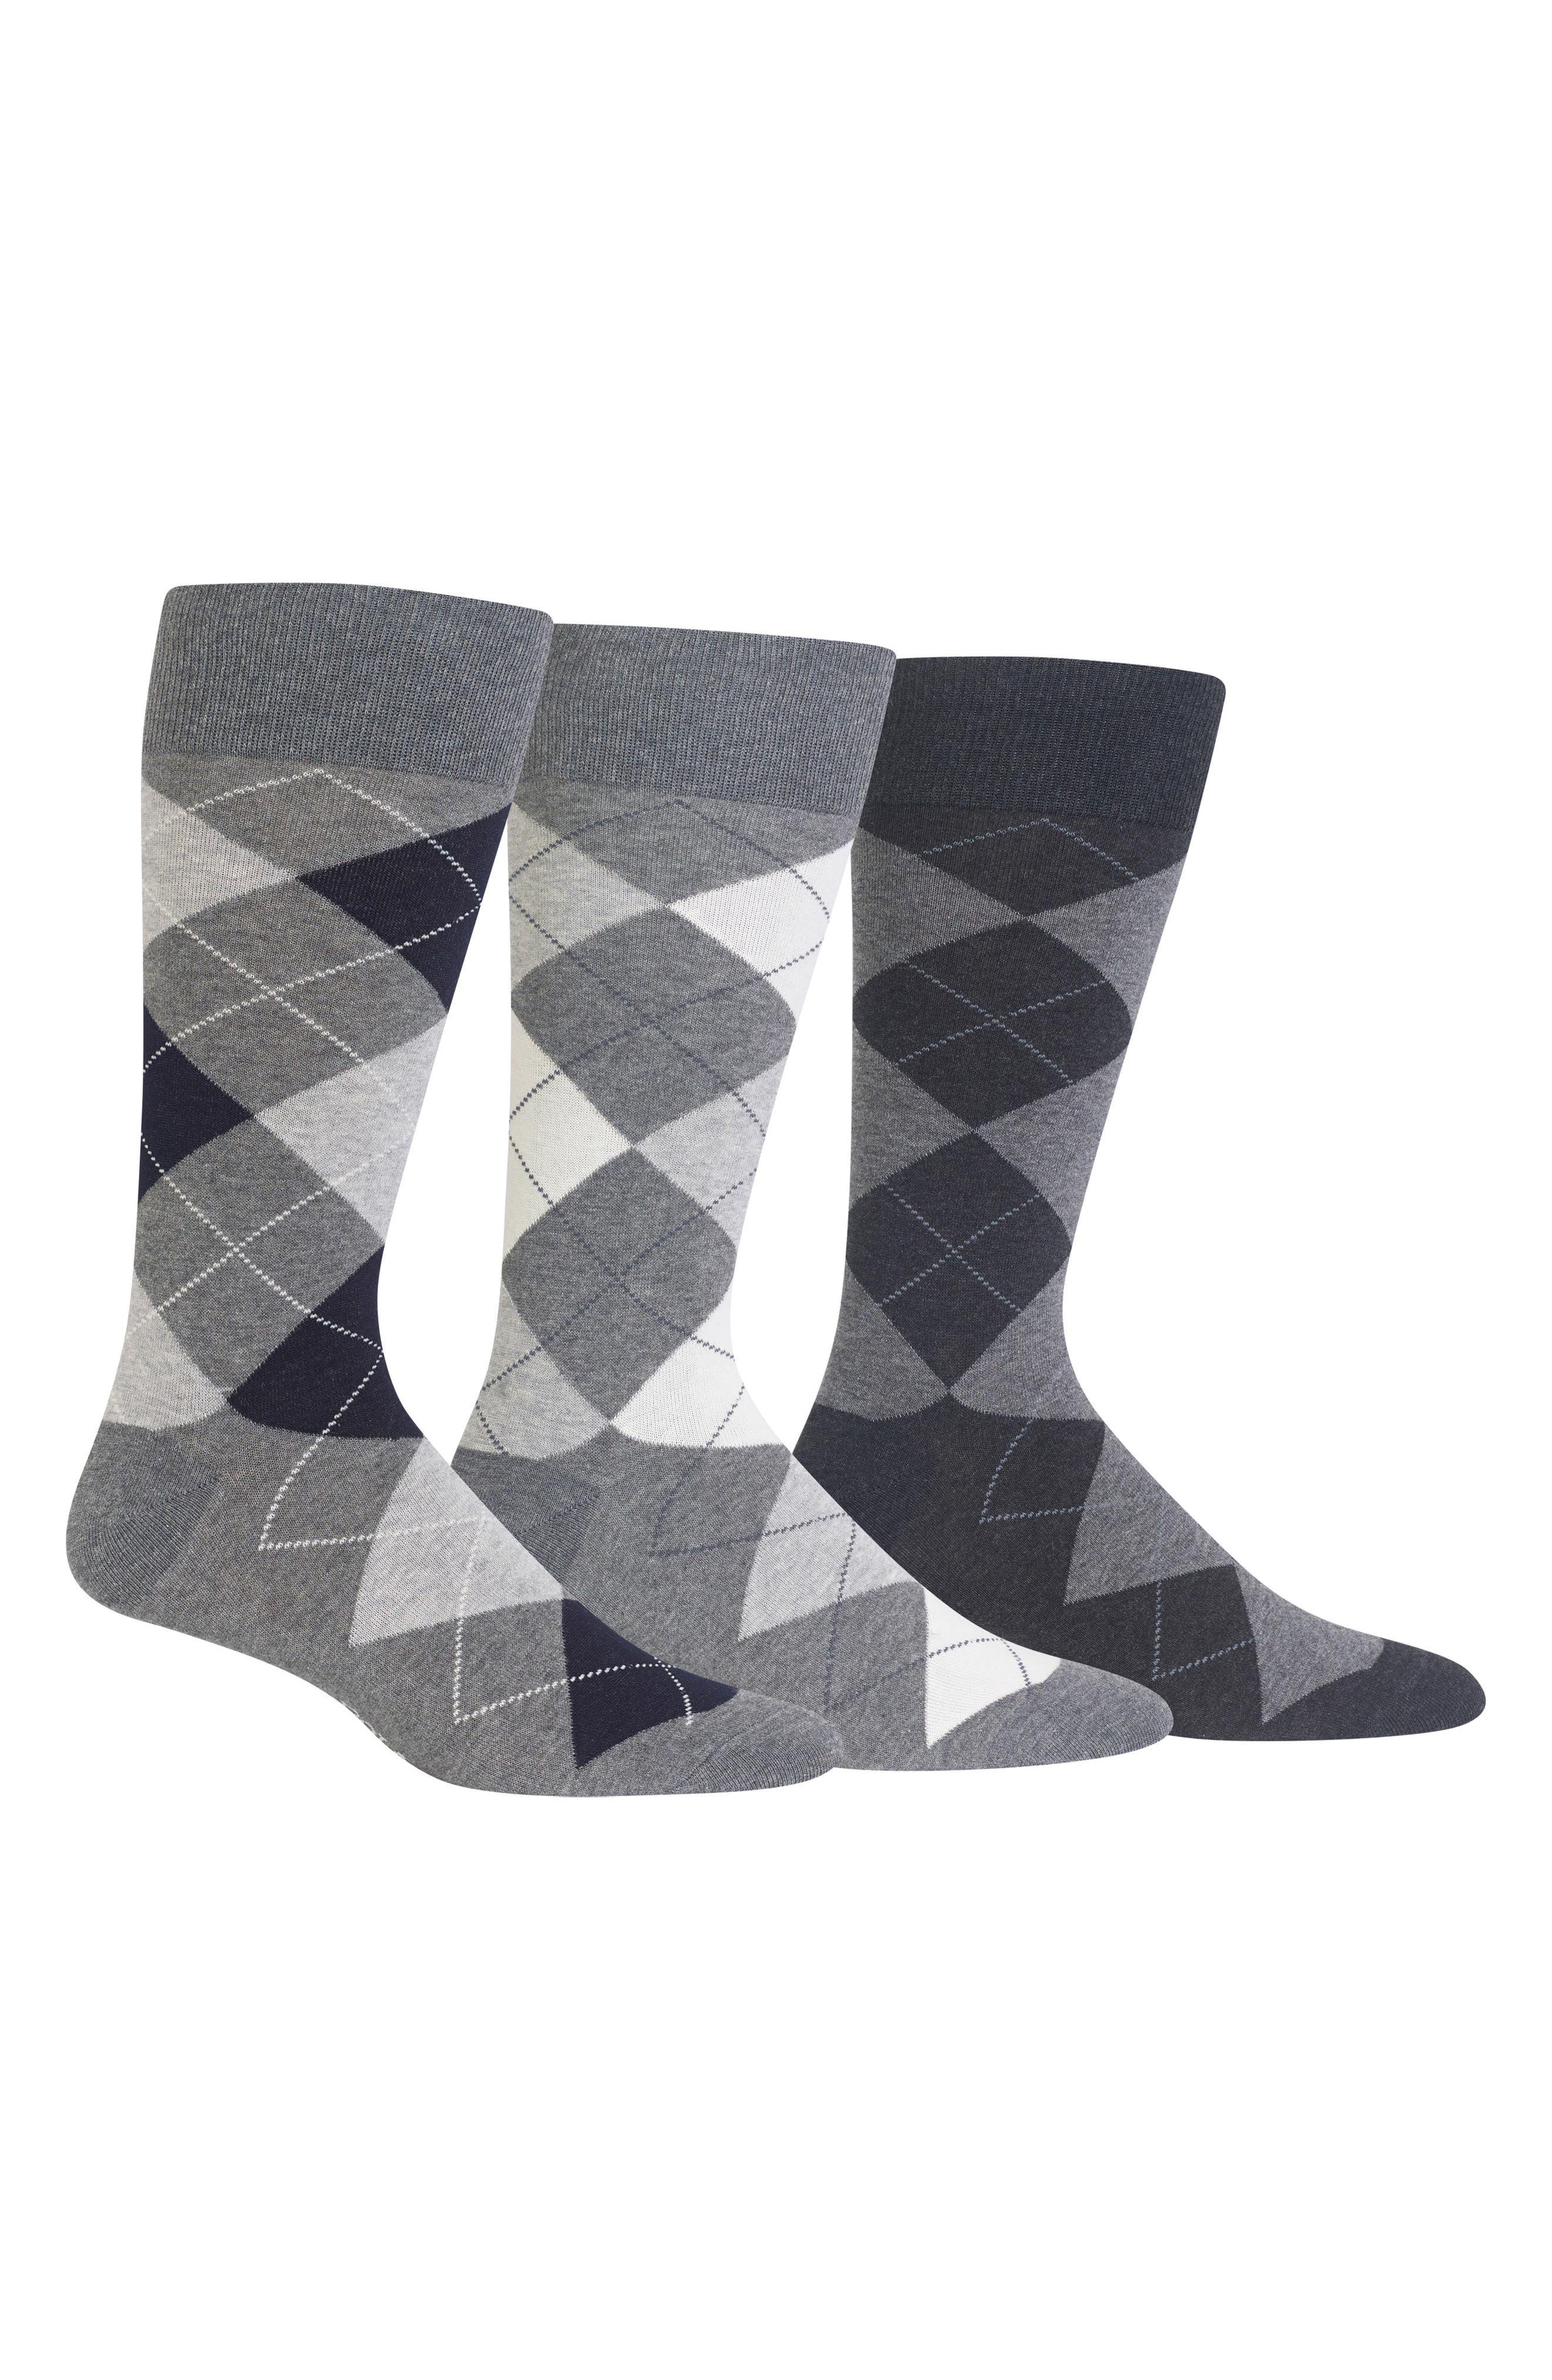 3-Pack Argyle Socks,                             Main thumbnail 1, color,                             023